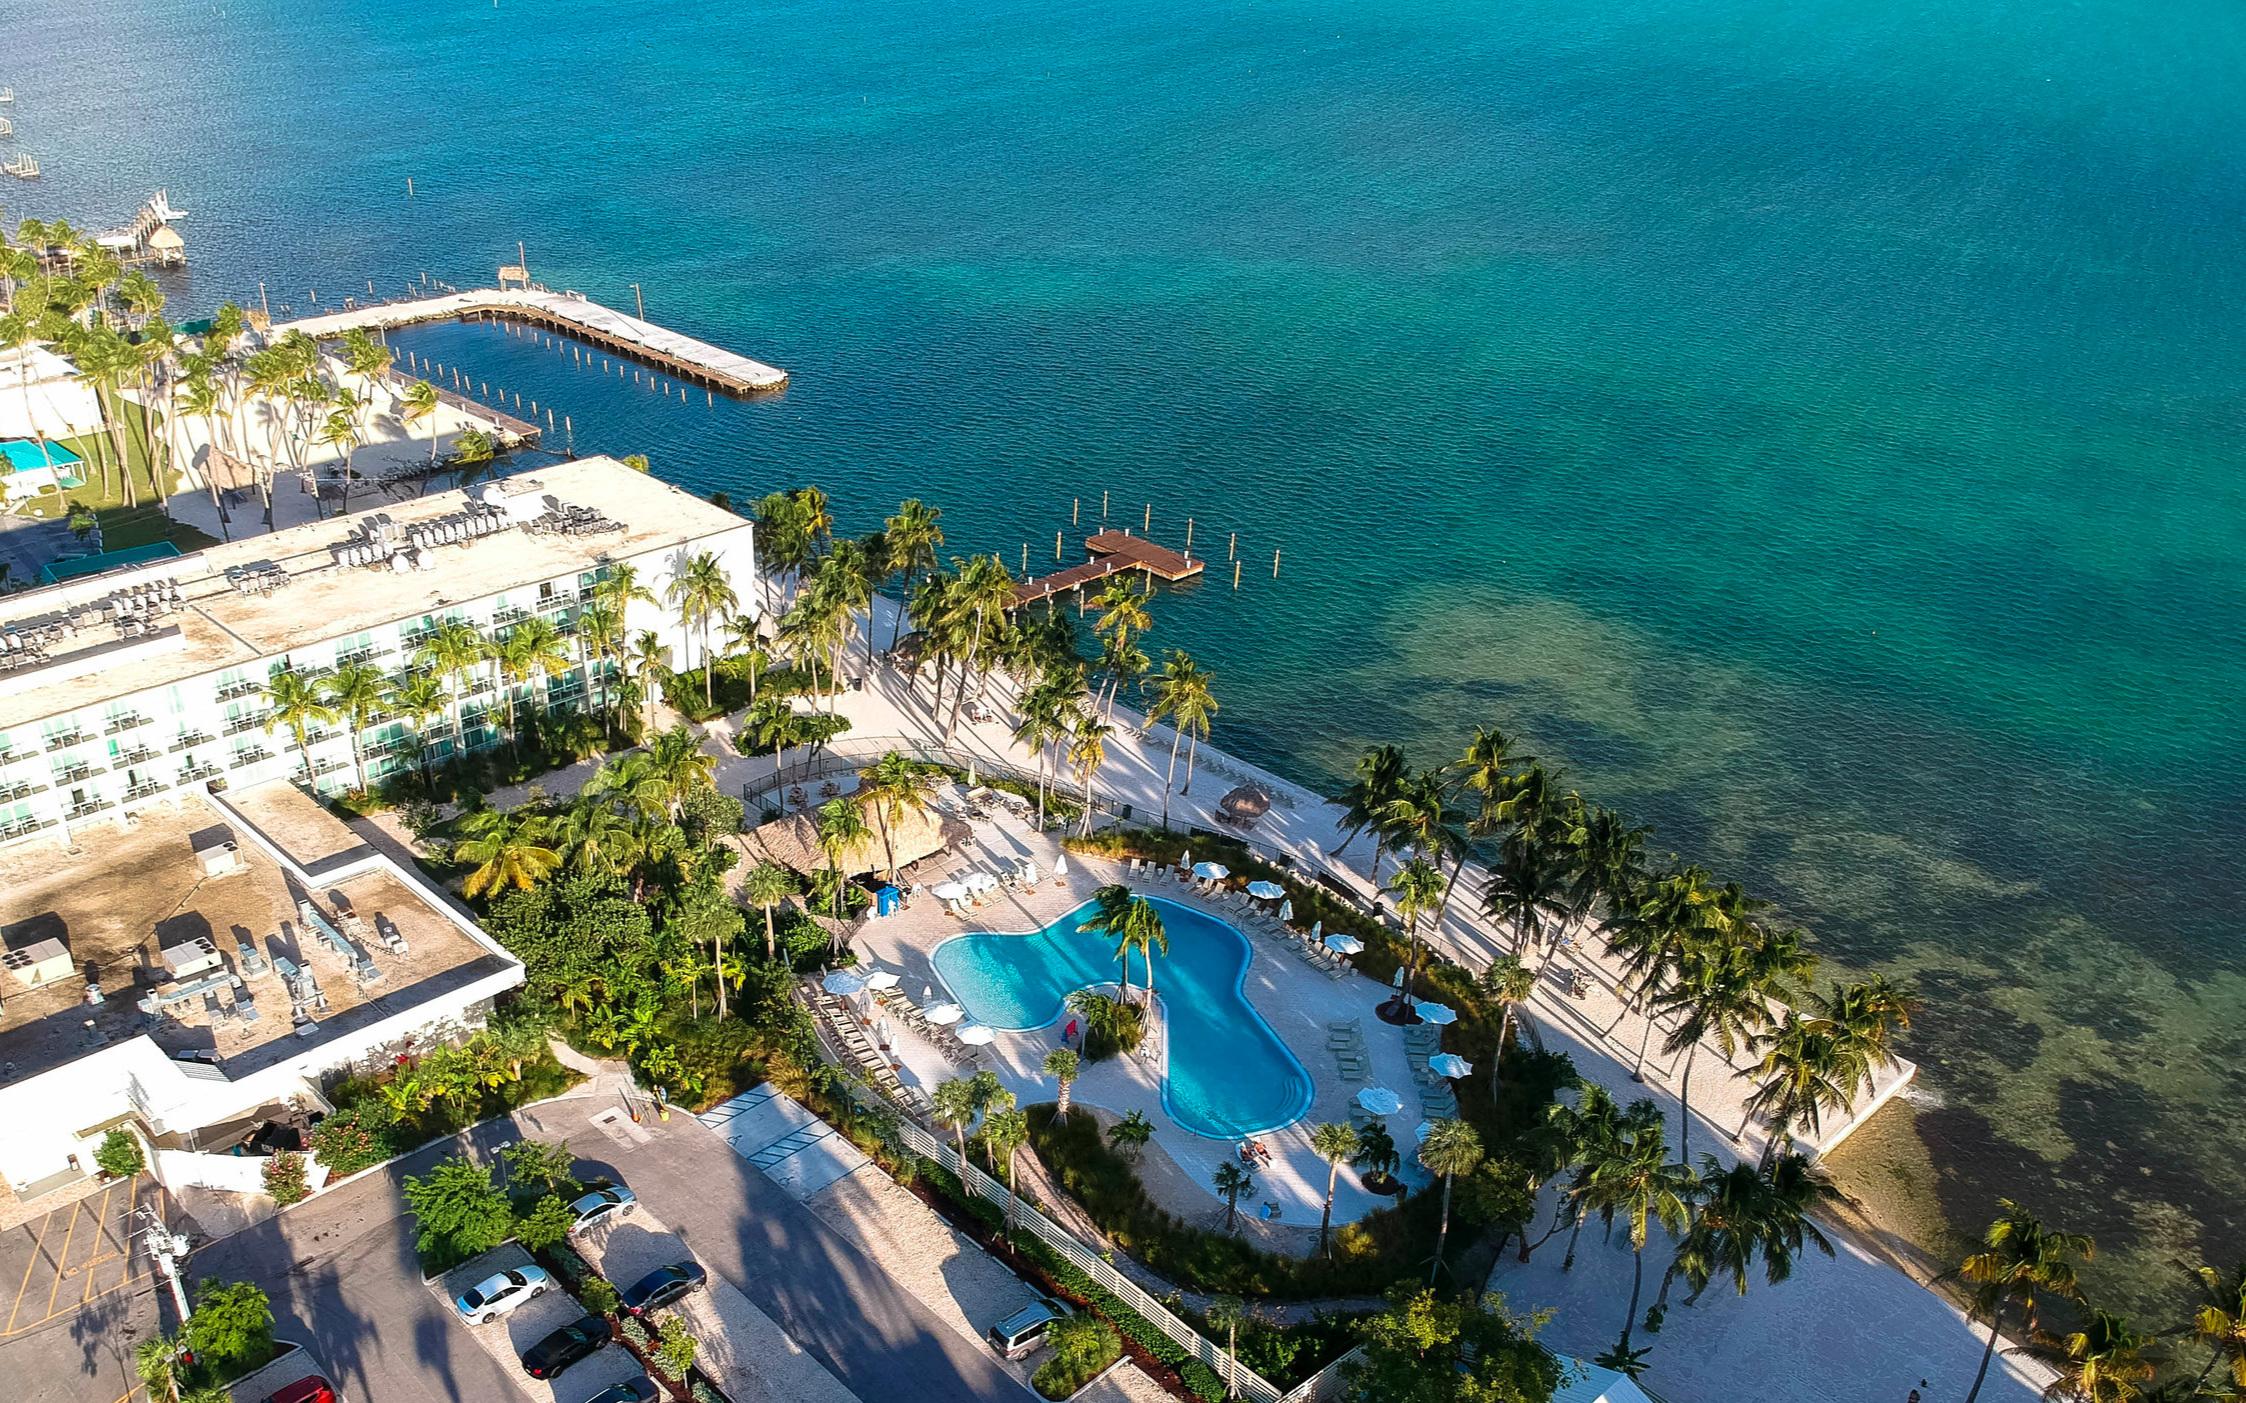 Amara Cay Resort from above.